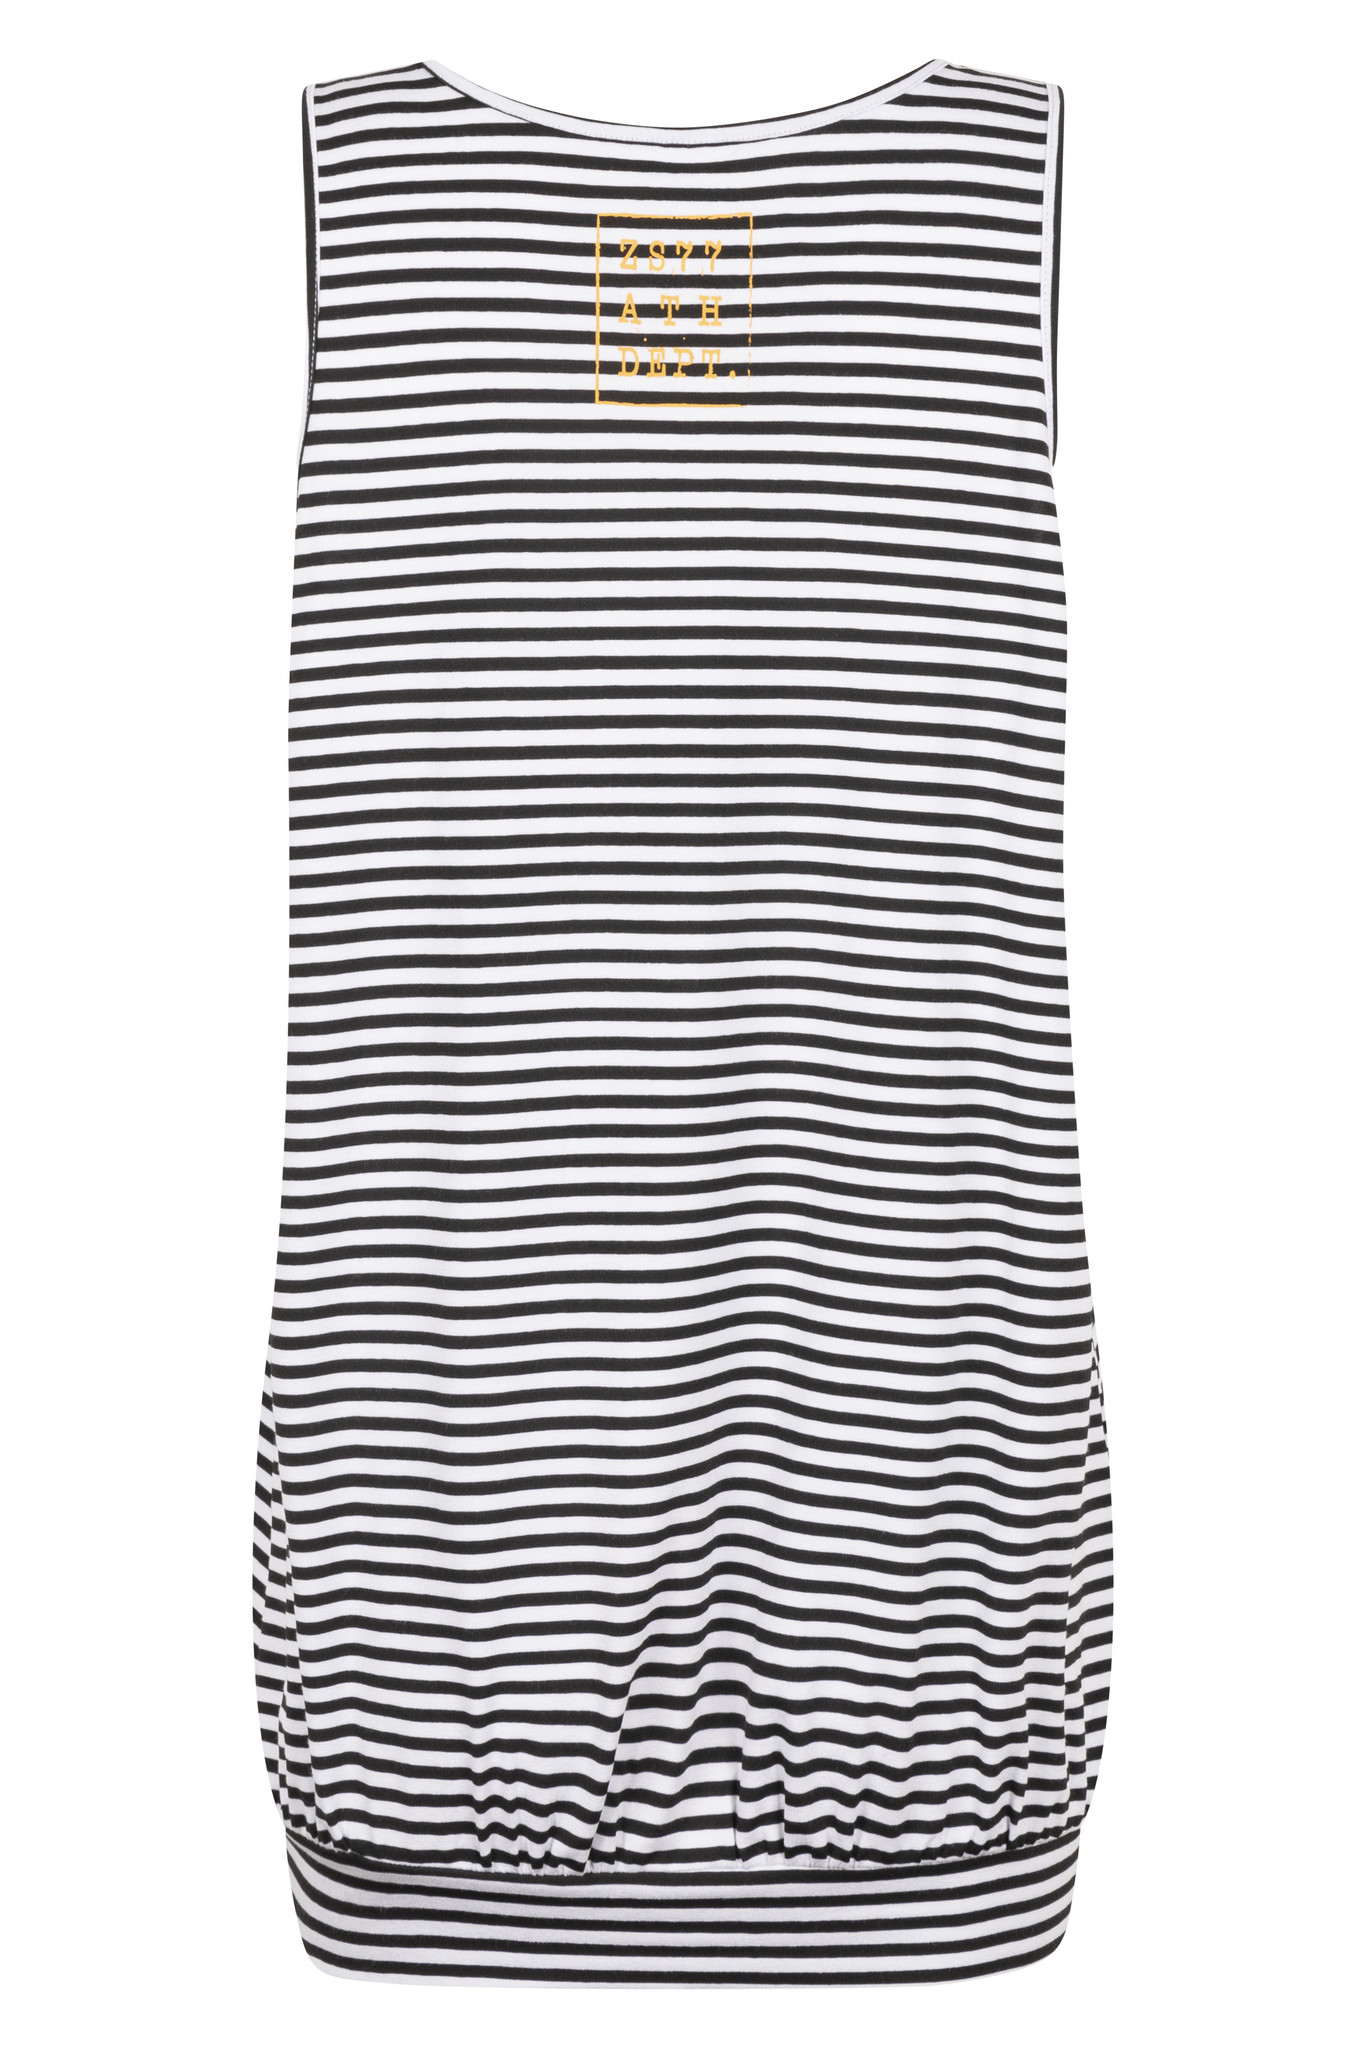 Zoso Zoso Lilian t-shirt striped with print summergold